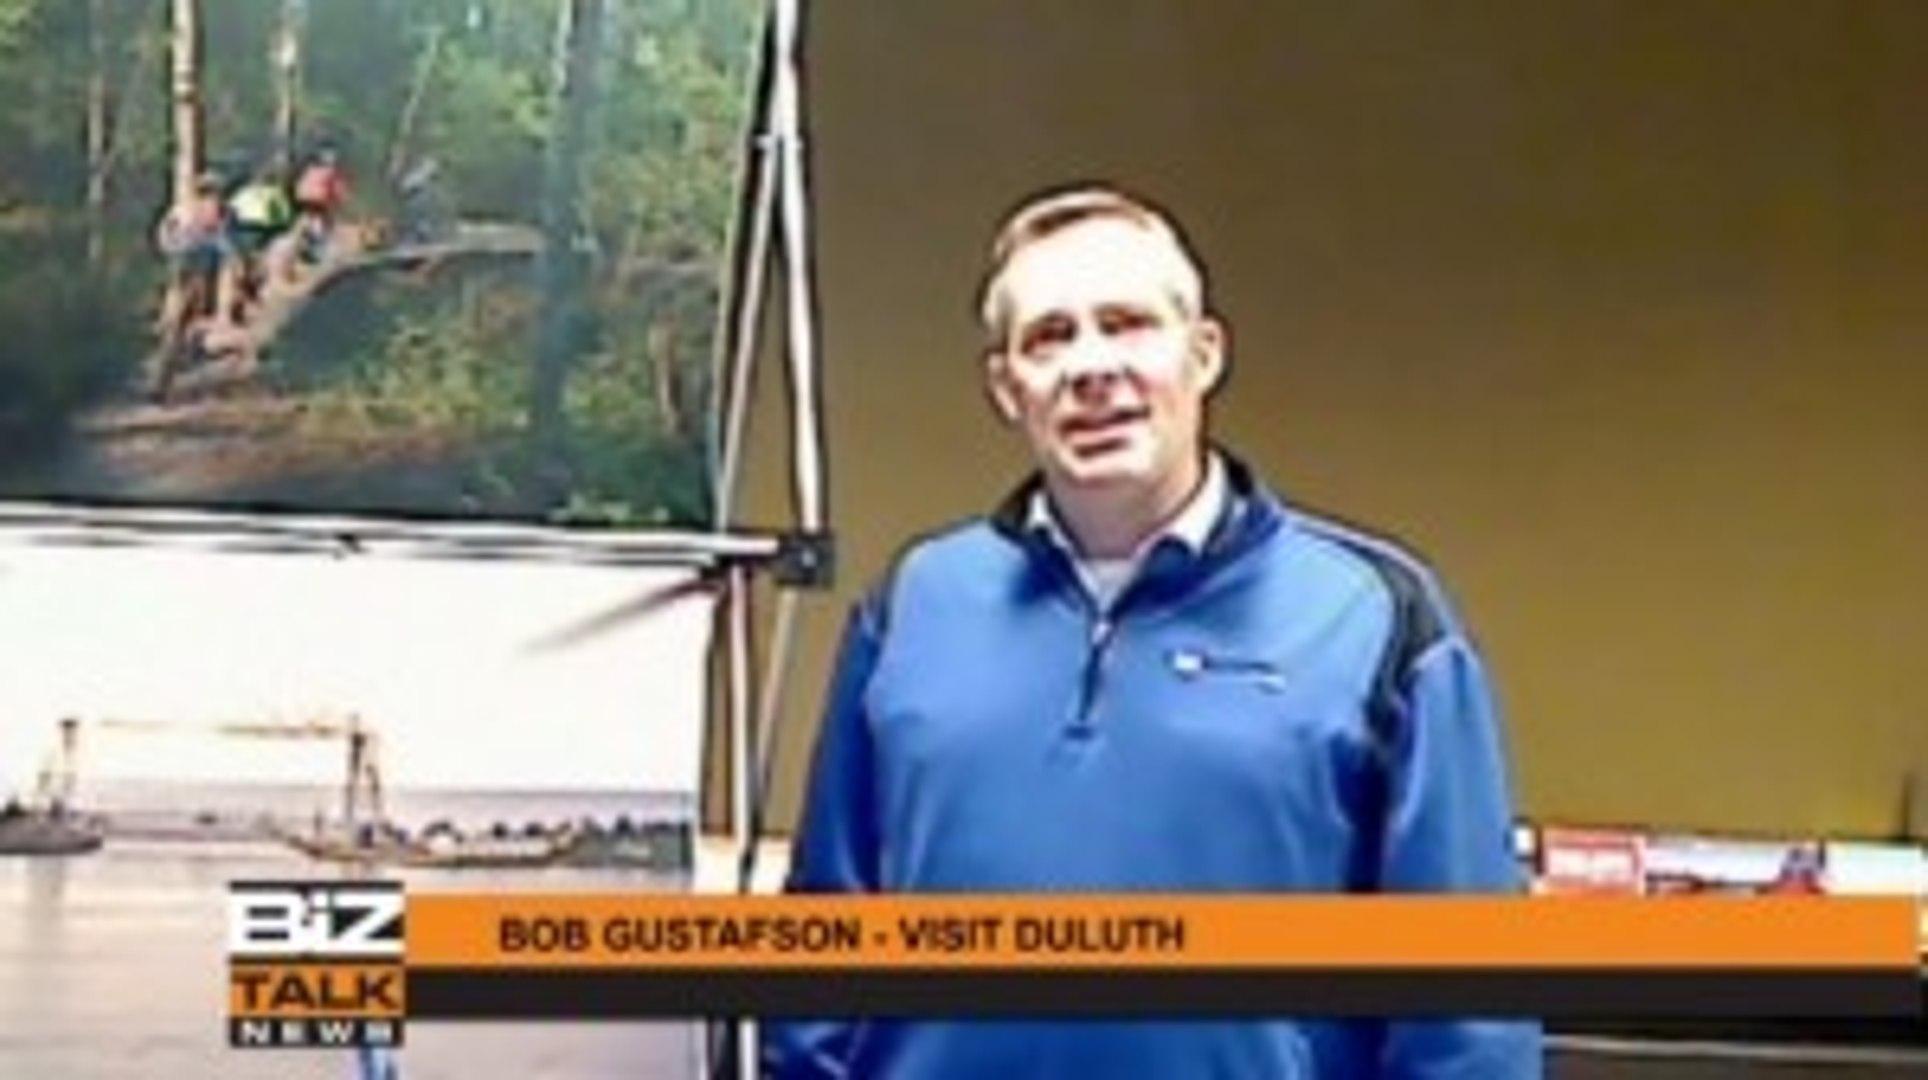 BizTalk Discovery: Visit Duluth